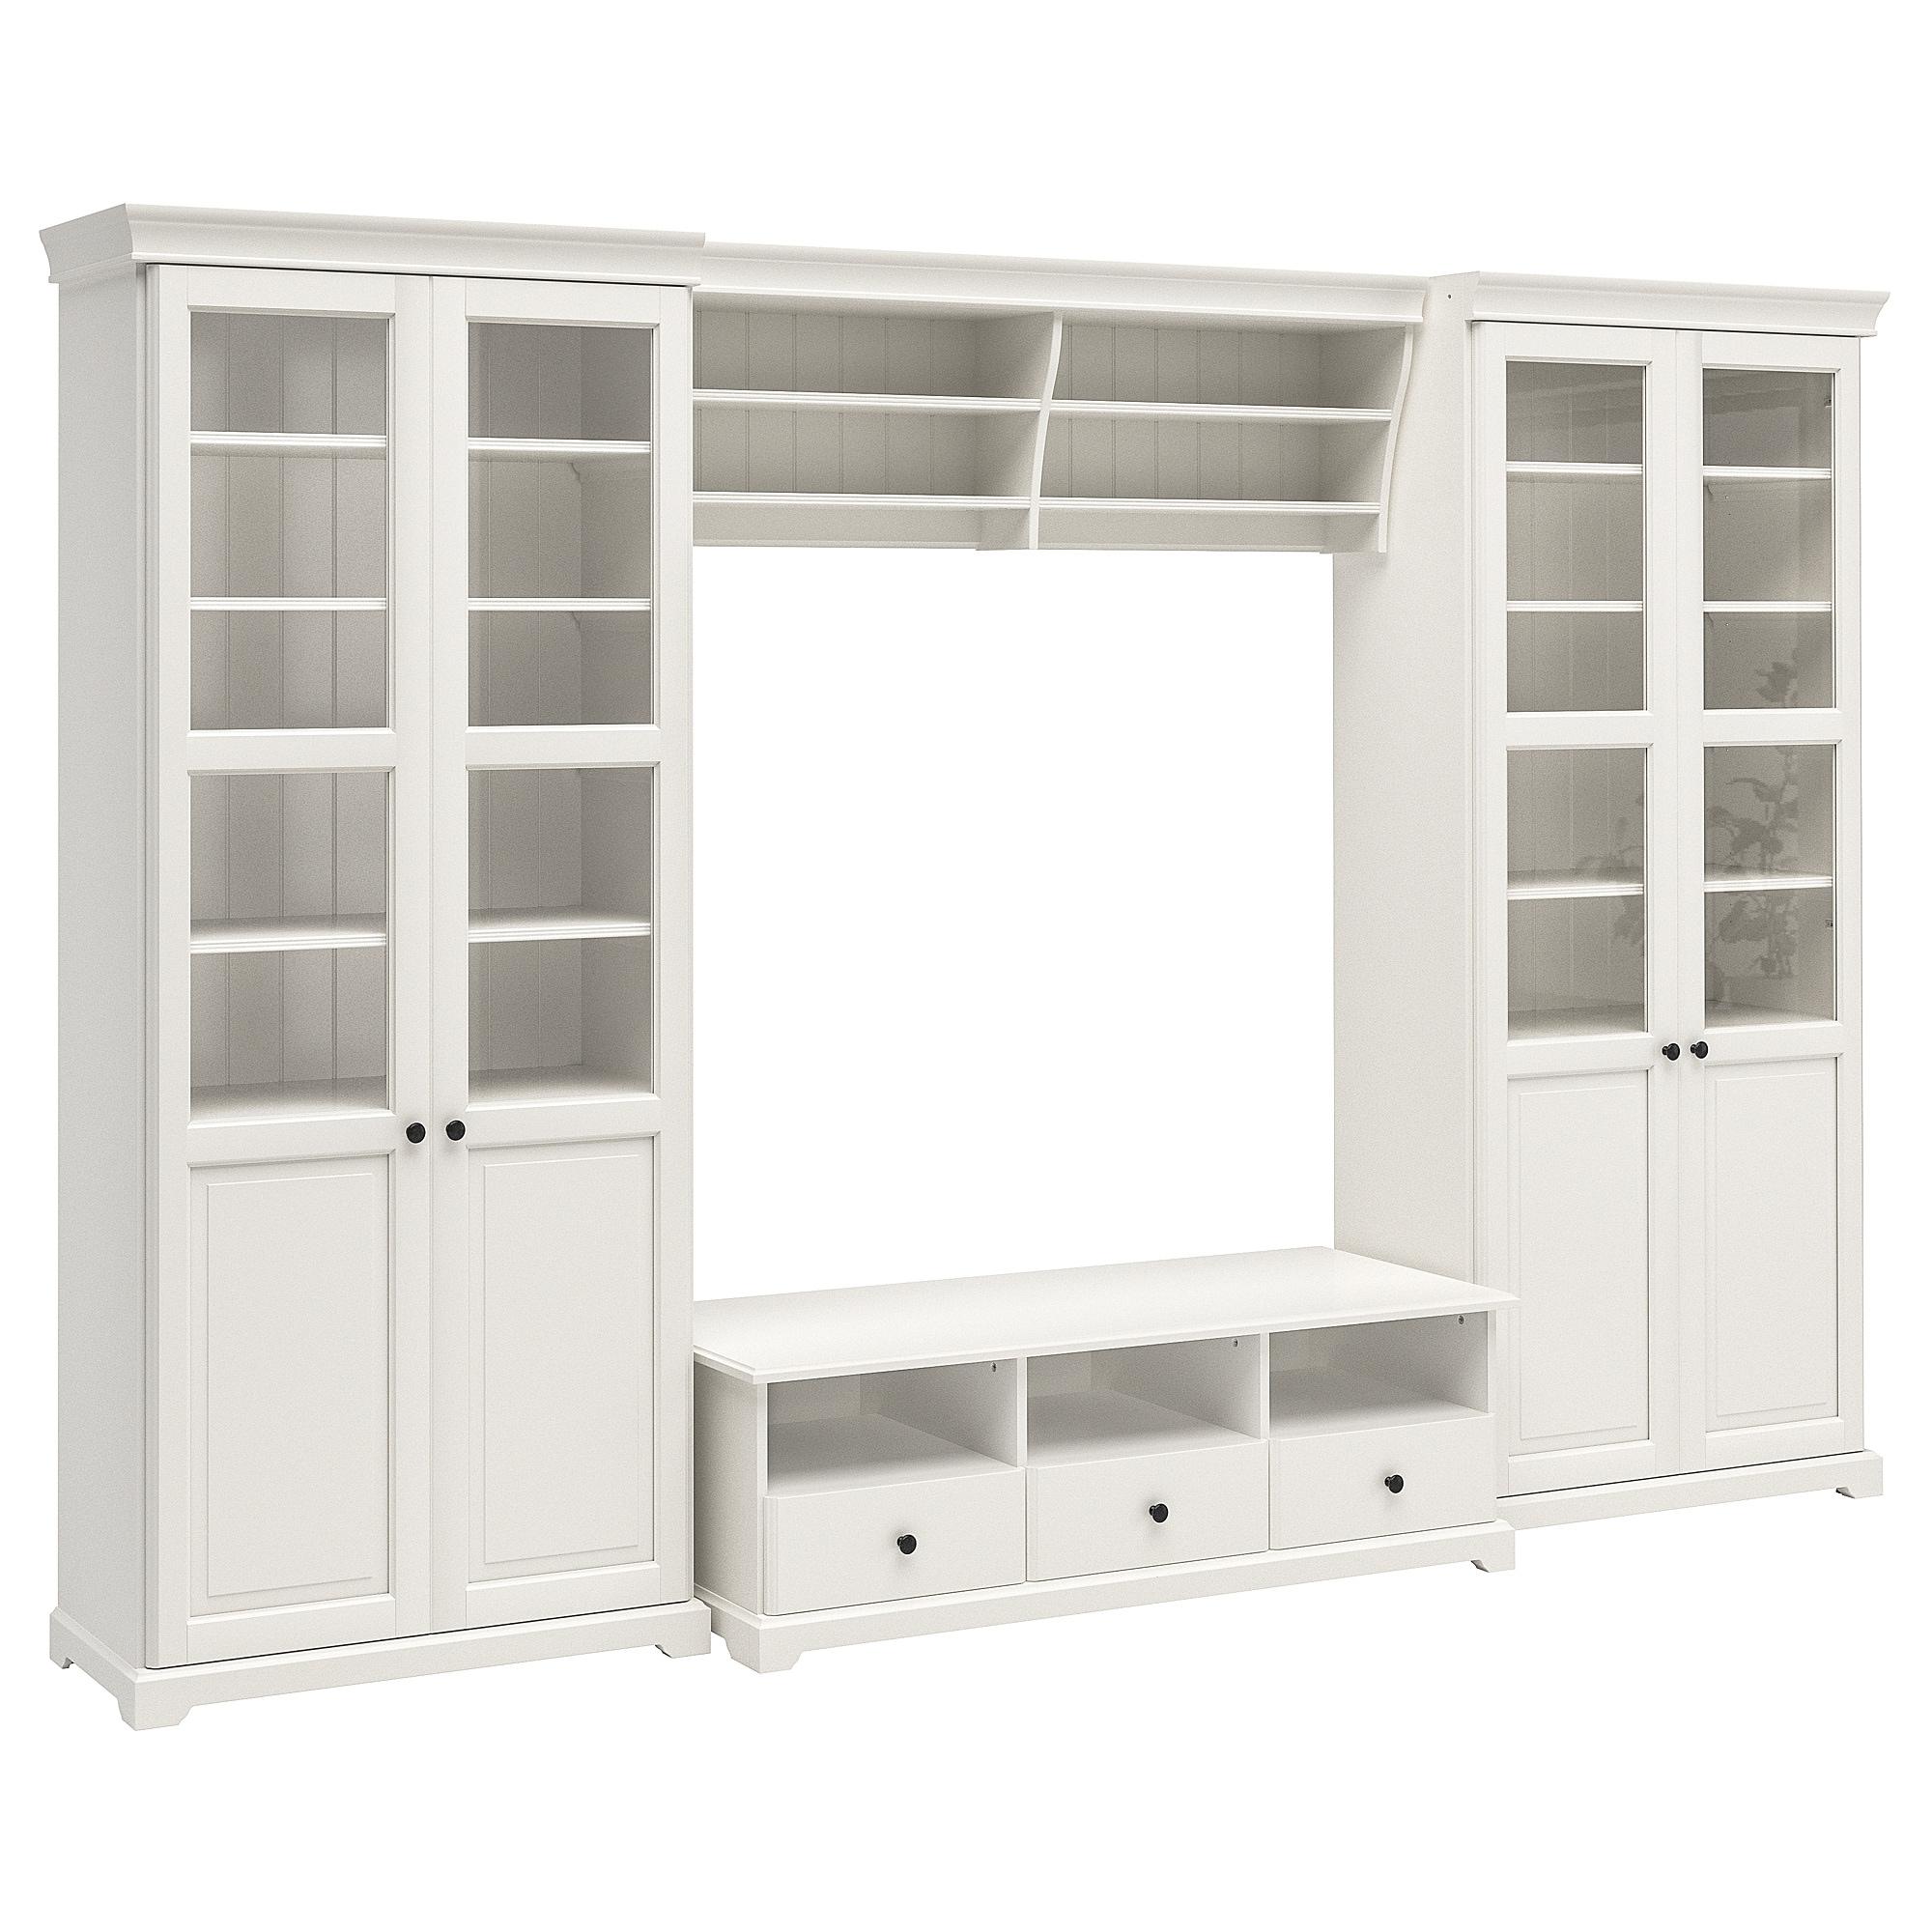 Mueble Blanco Ikea Nkde Liatorp Mueble Tv Con Almacenaje Blanco 332 X 214 Cm Ikea